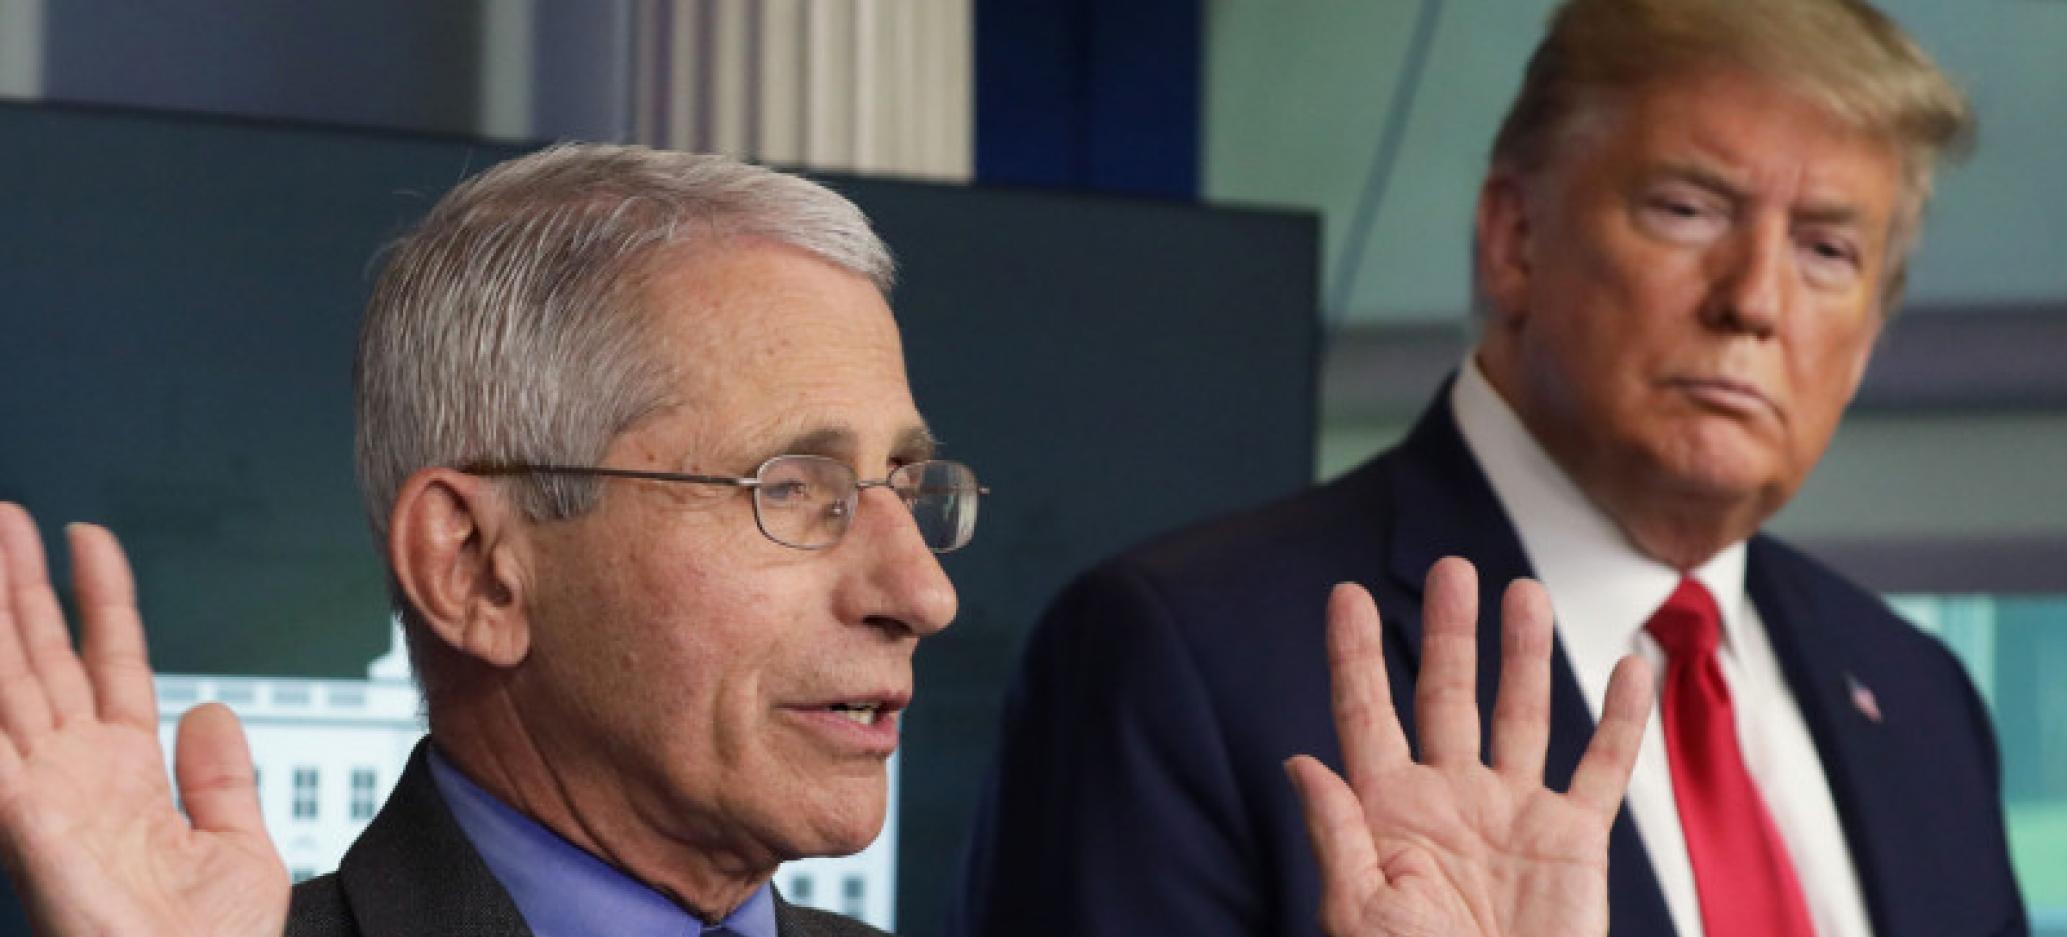 Trump Thinks Dr. Fauci is 'A Little Bit of an Alarmist'